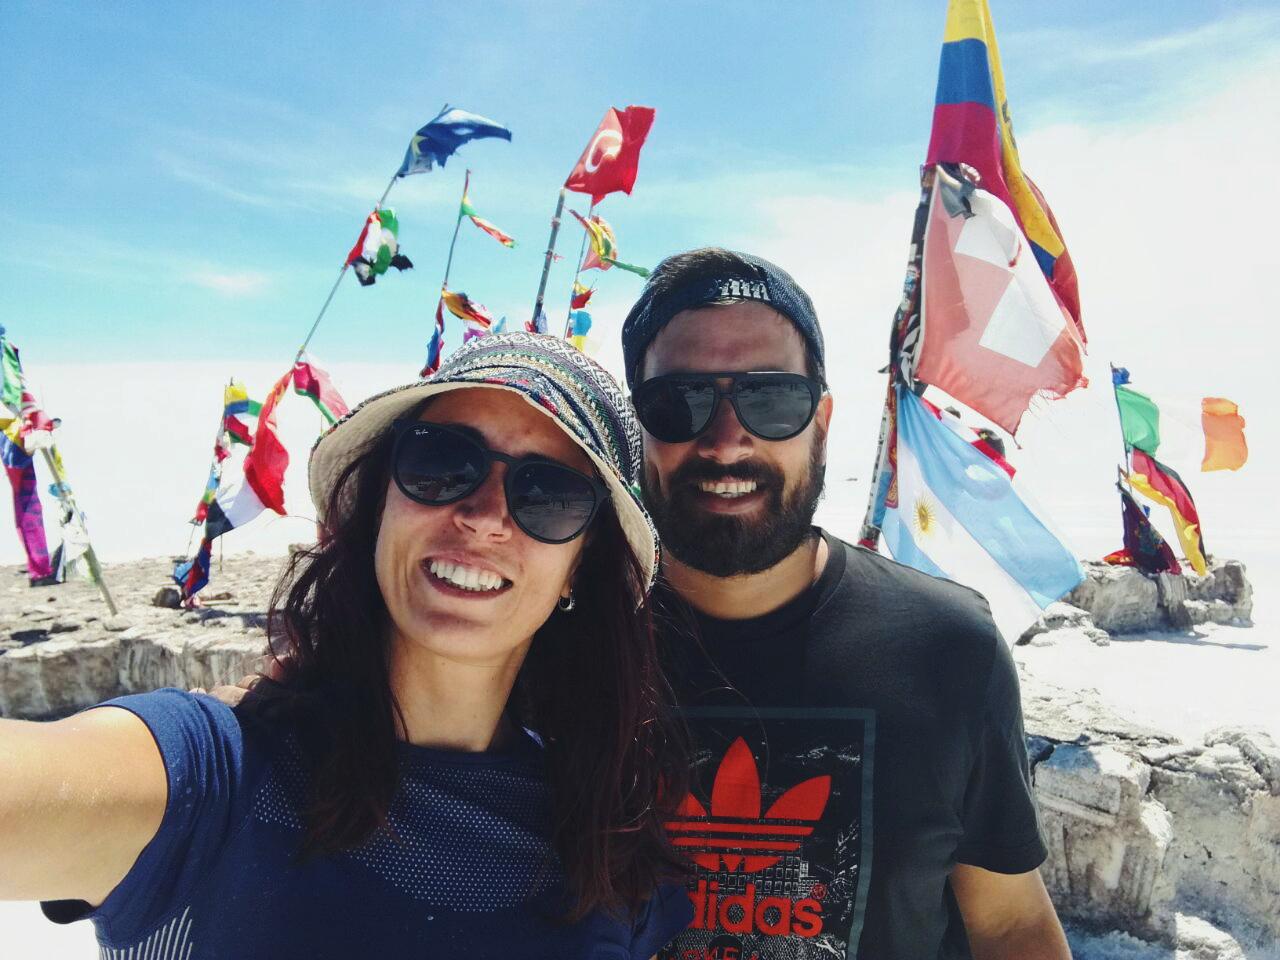 Vuelta al mundo - Uyuni - Bolivia.jpg